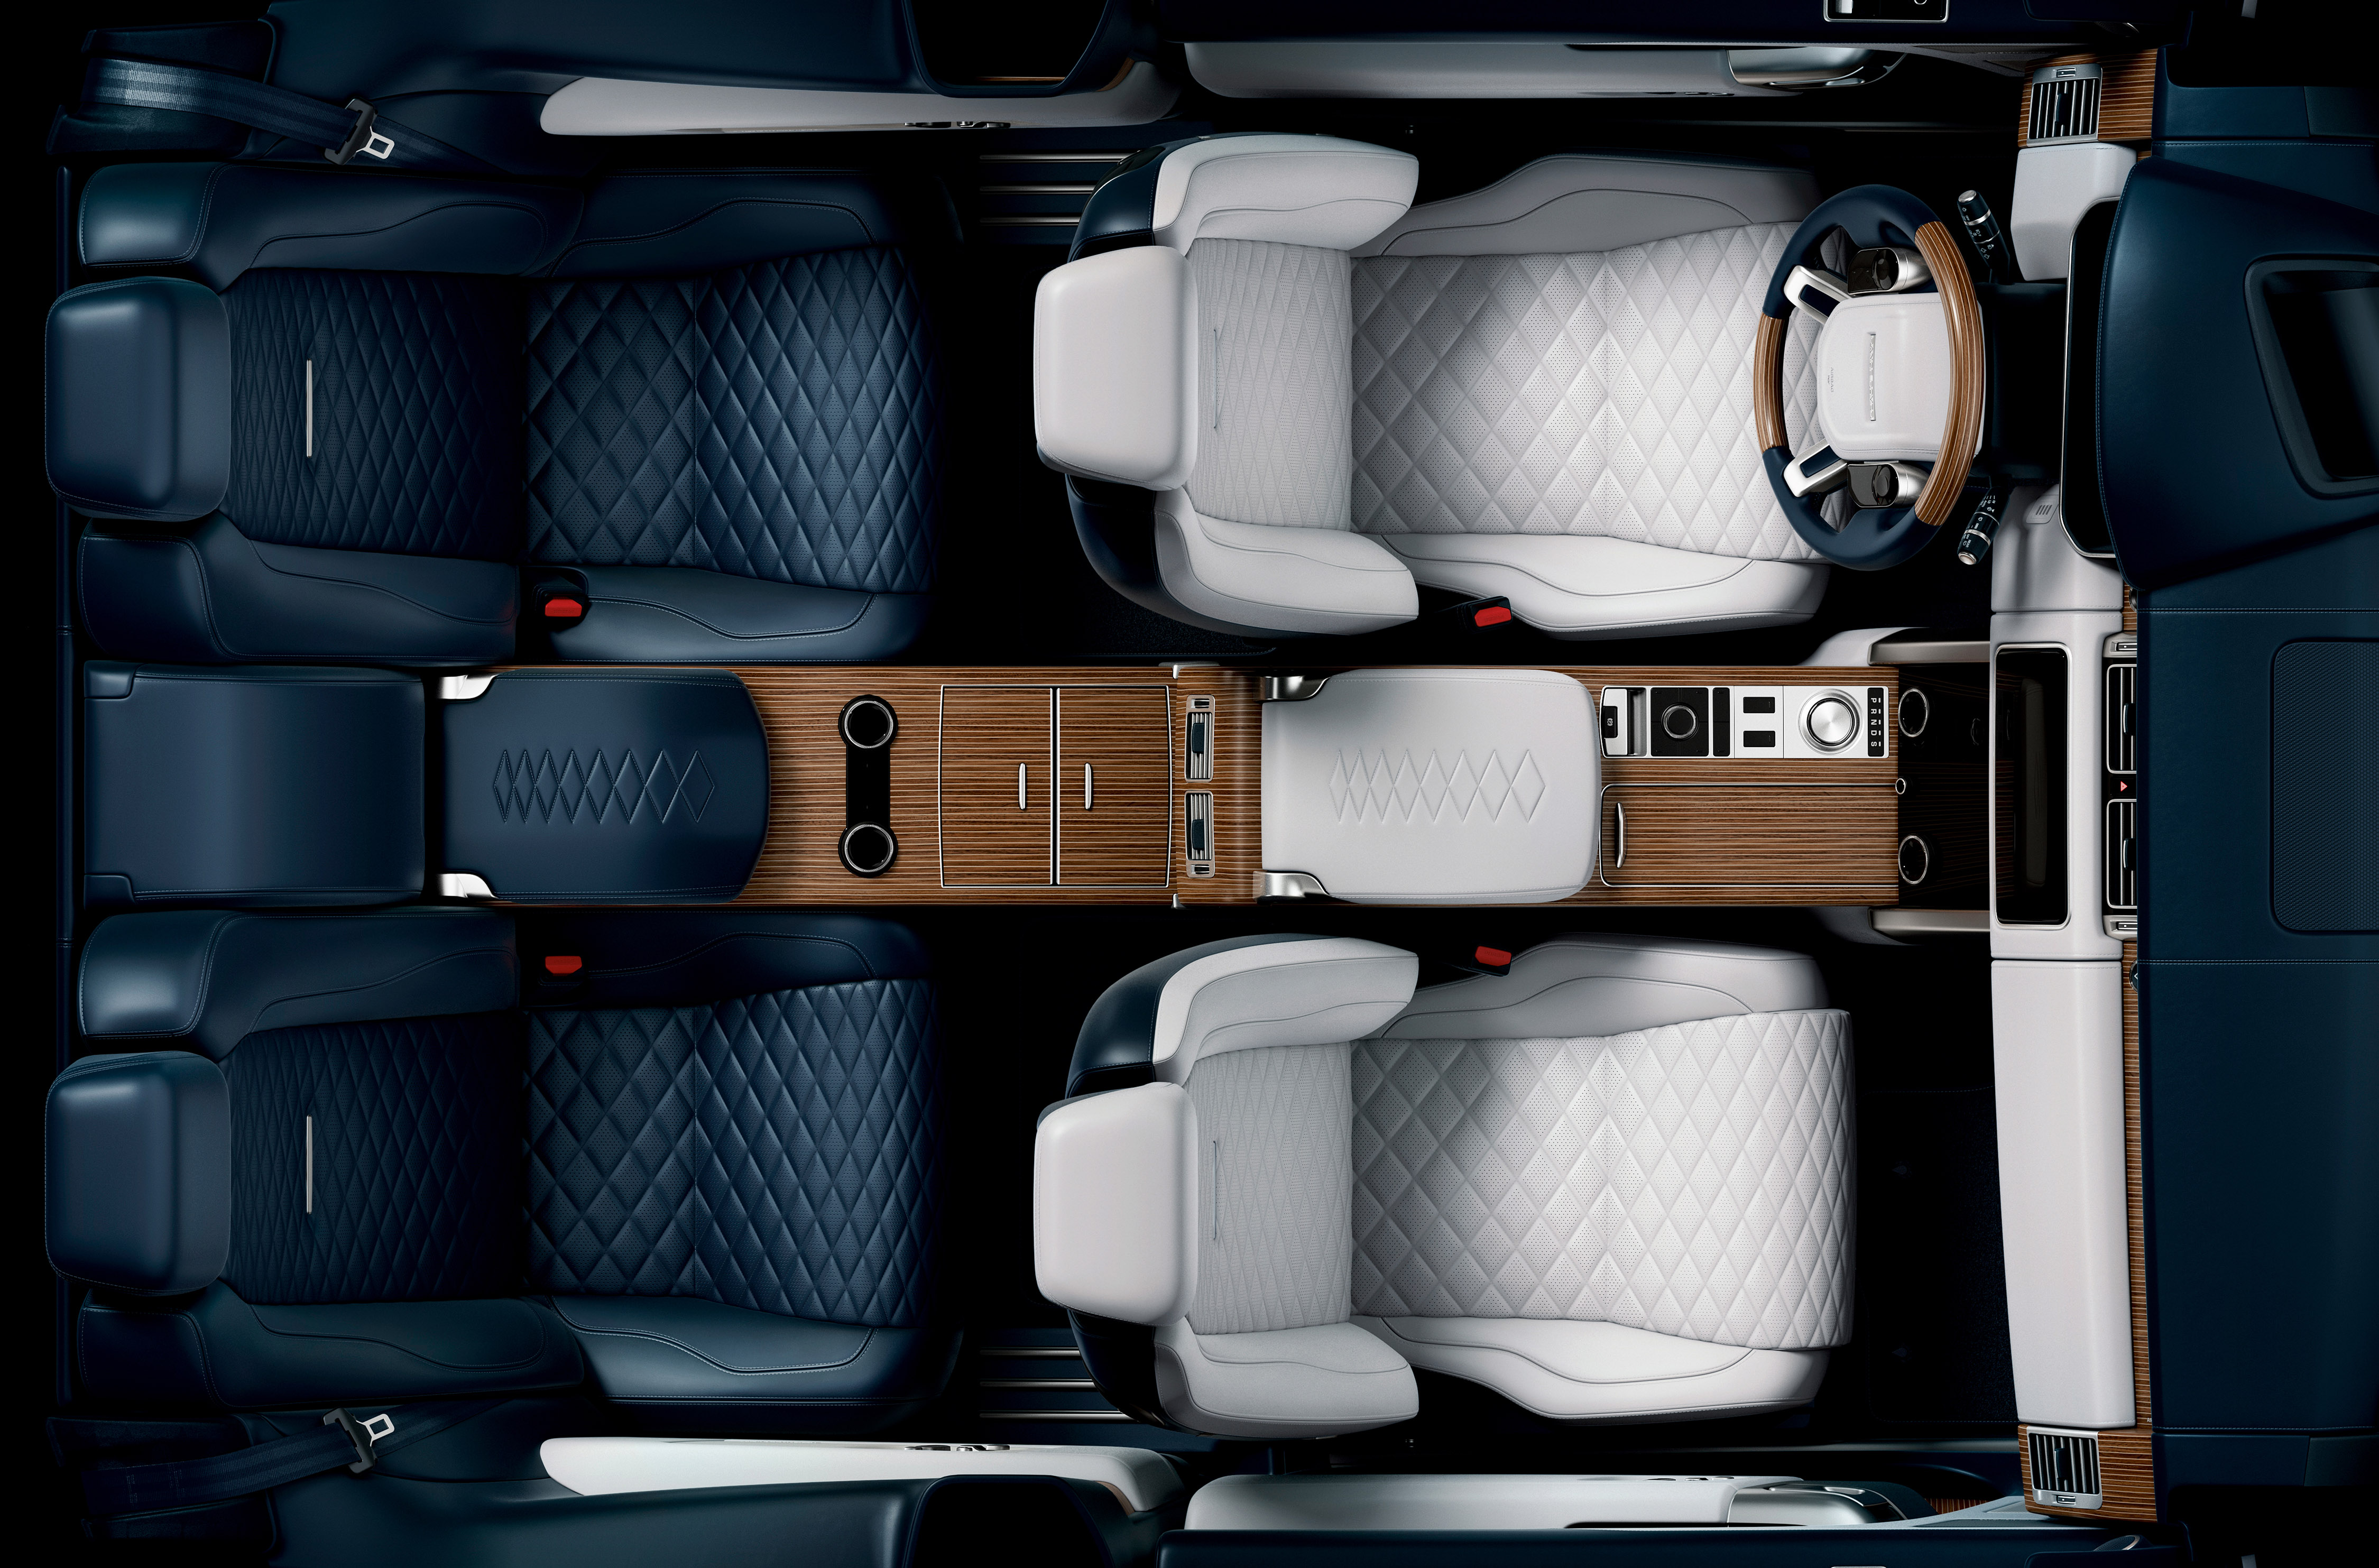 273742 05 range rover sv coupe 0d7e49 original 1519909259